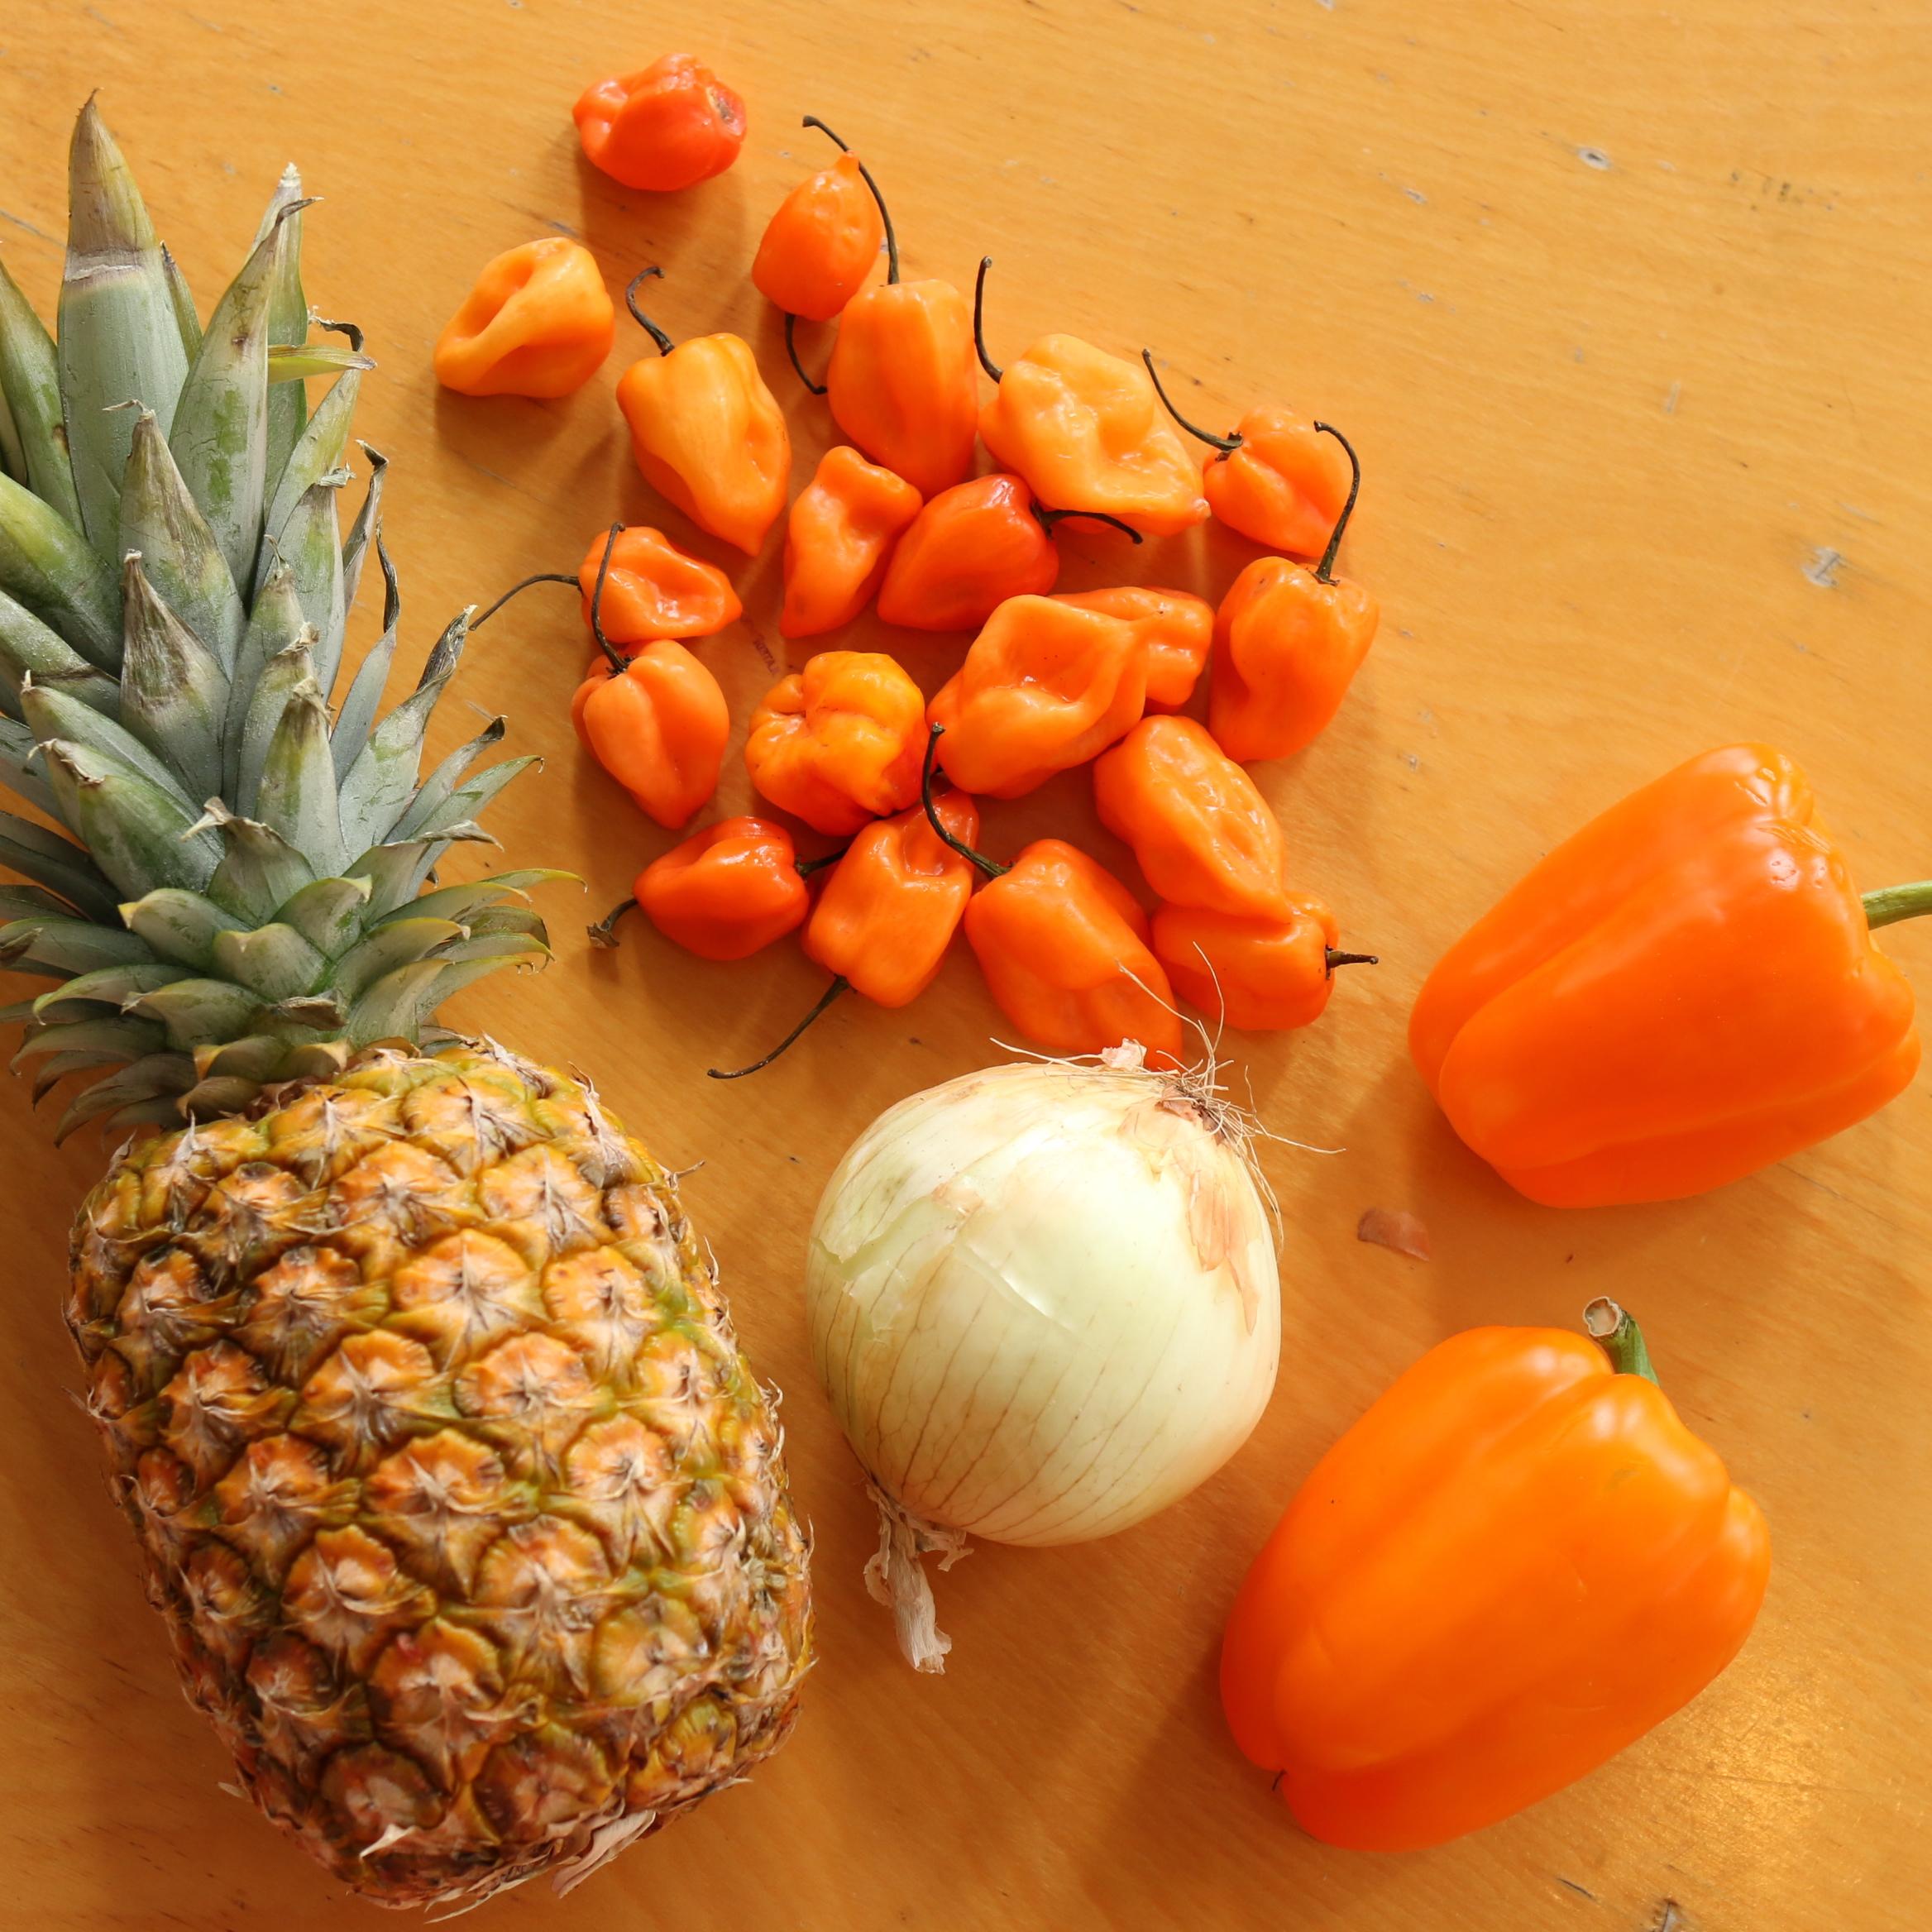 Recipe: Fermented Pineapple Habanero Hot Sauce